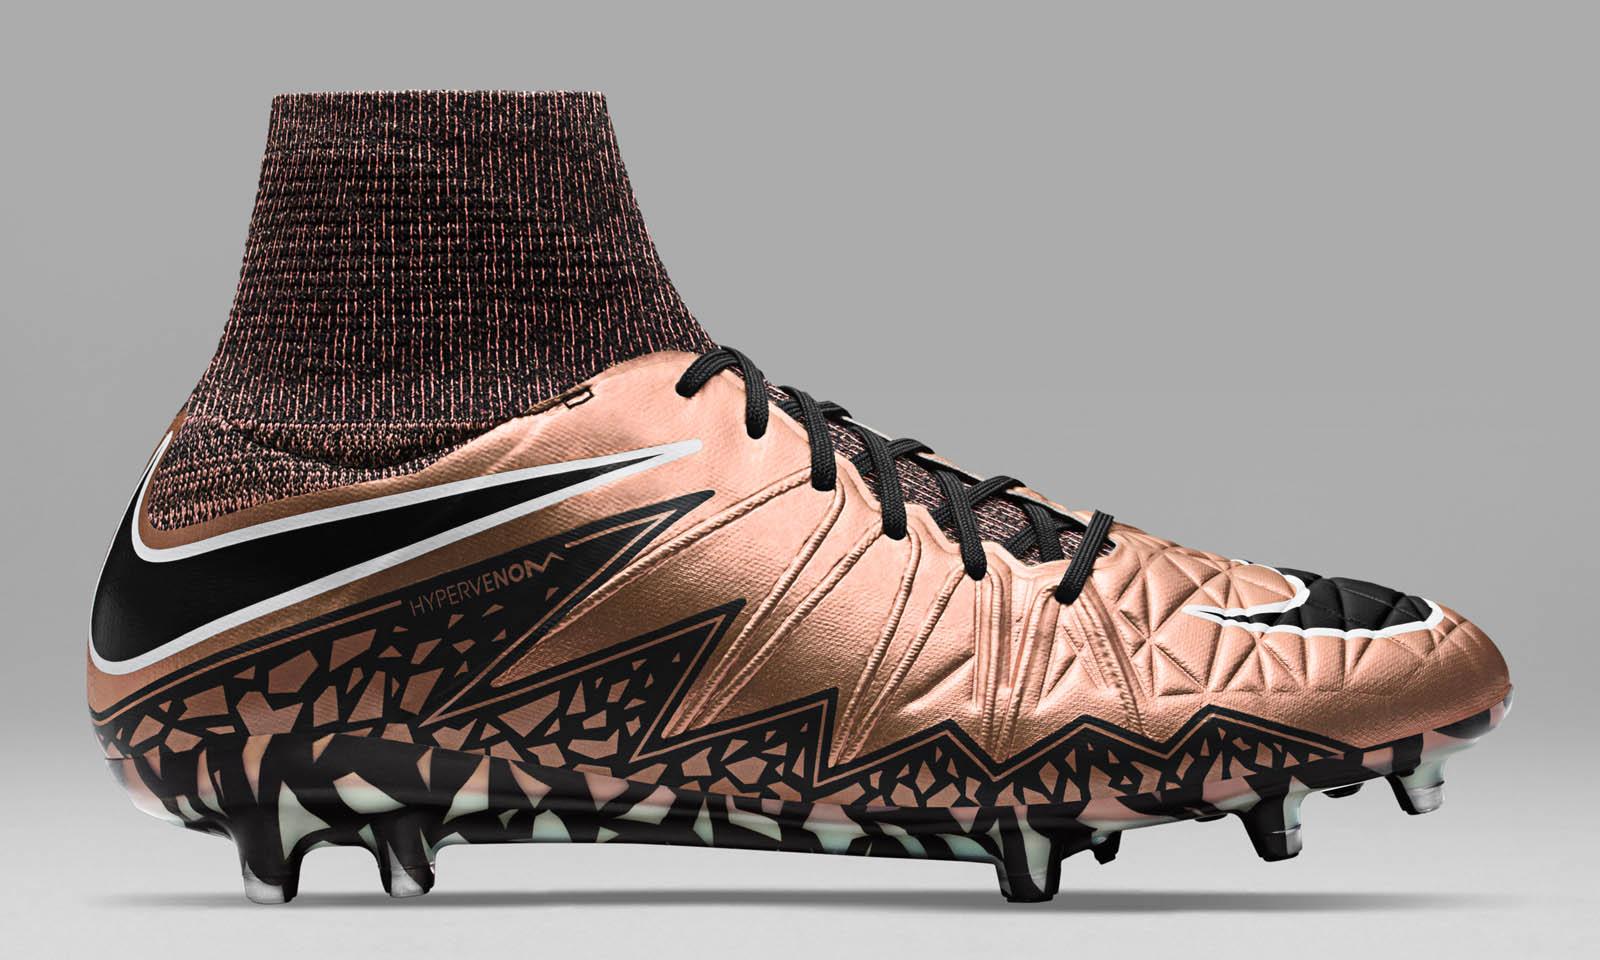 brand new 8f84f 4a874 ... Socken Nike Hypervenom Phantom II Bronze  Schwarz  Türkis ...